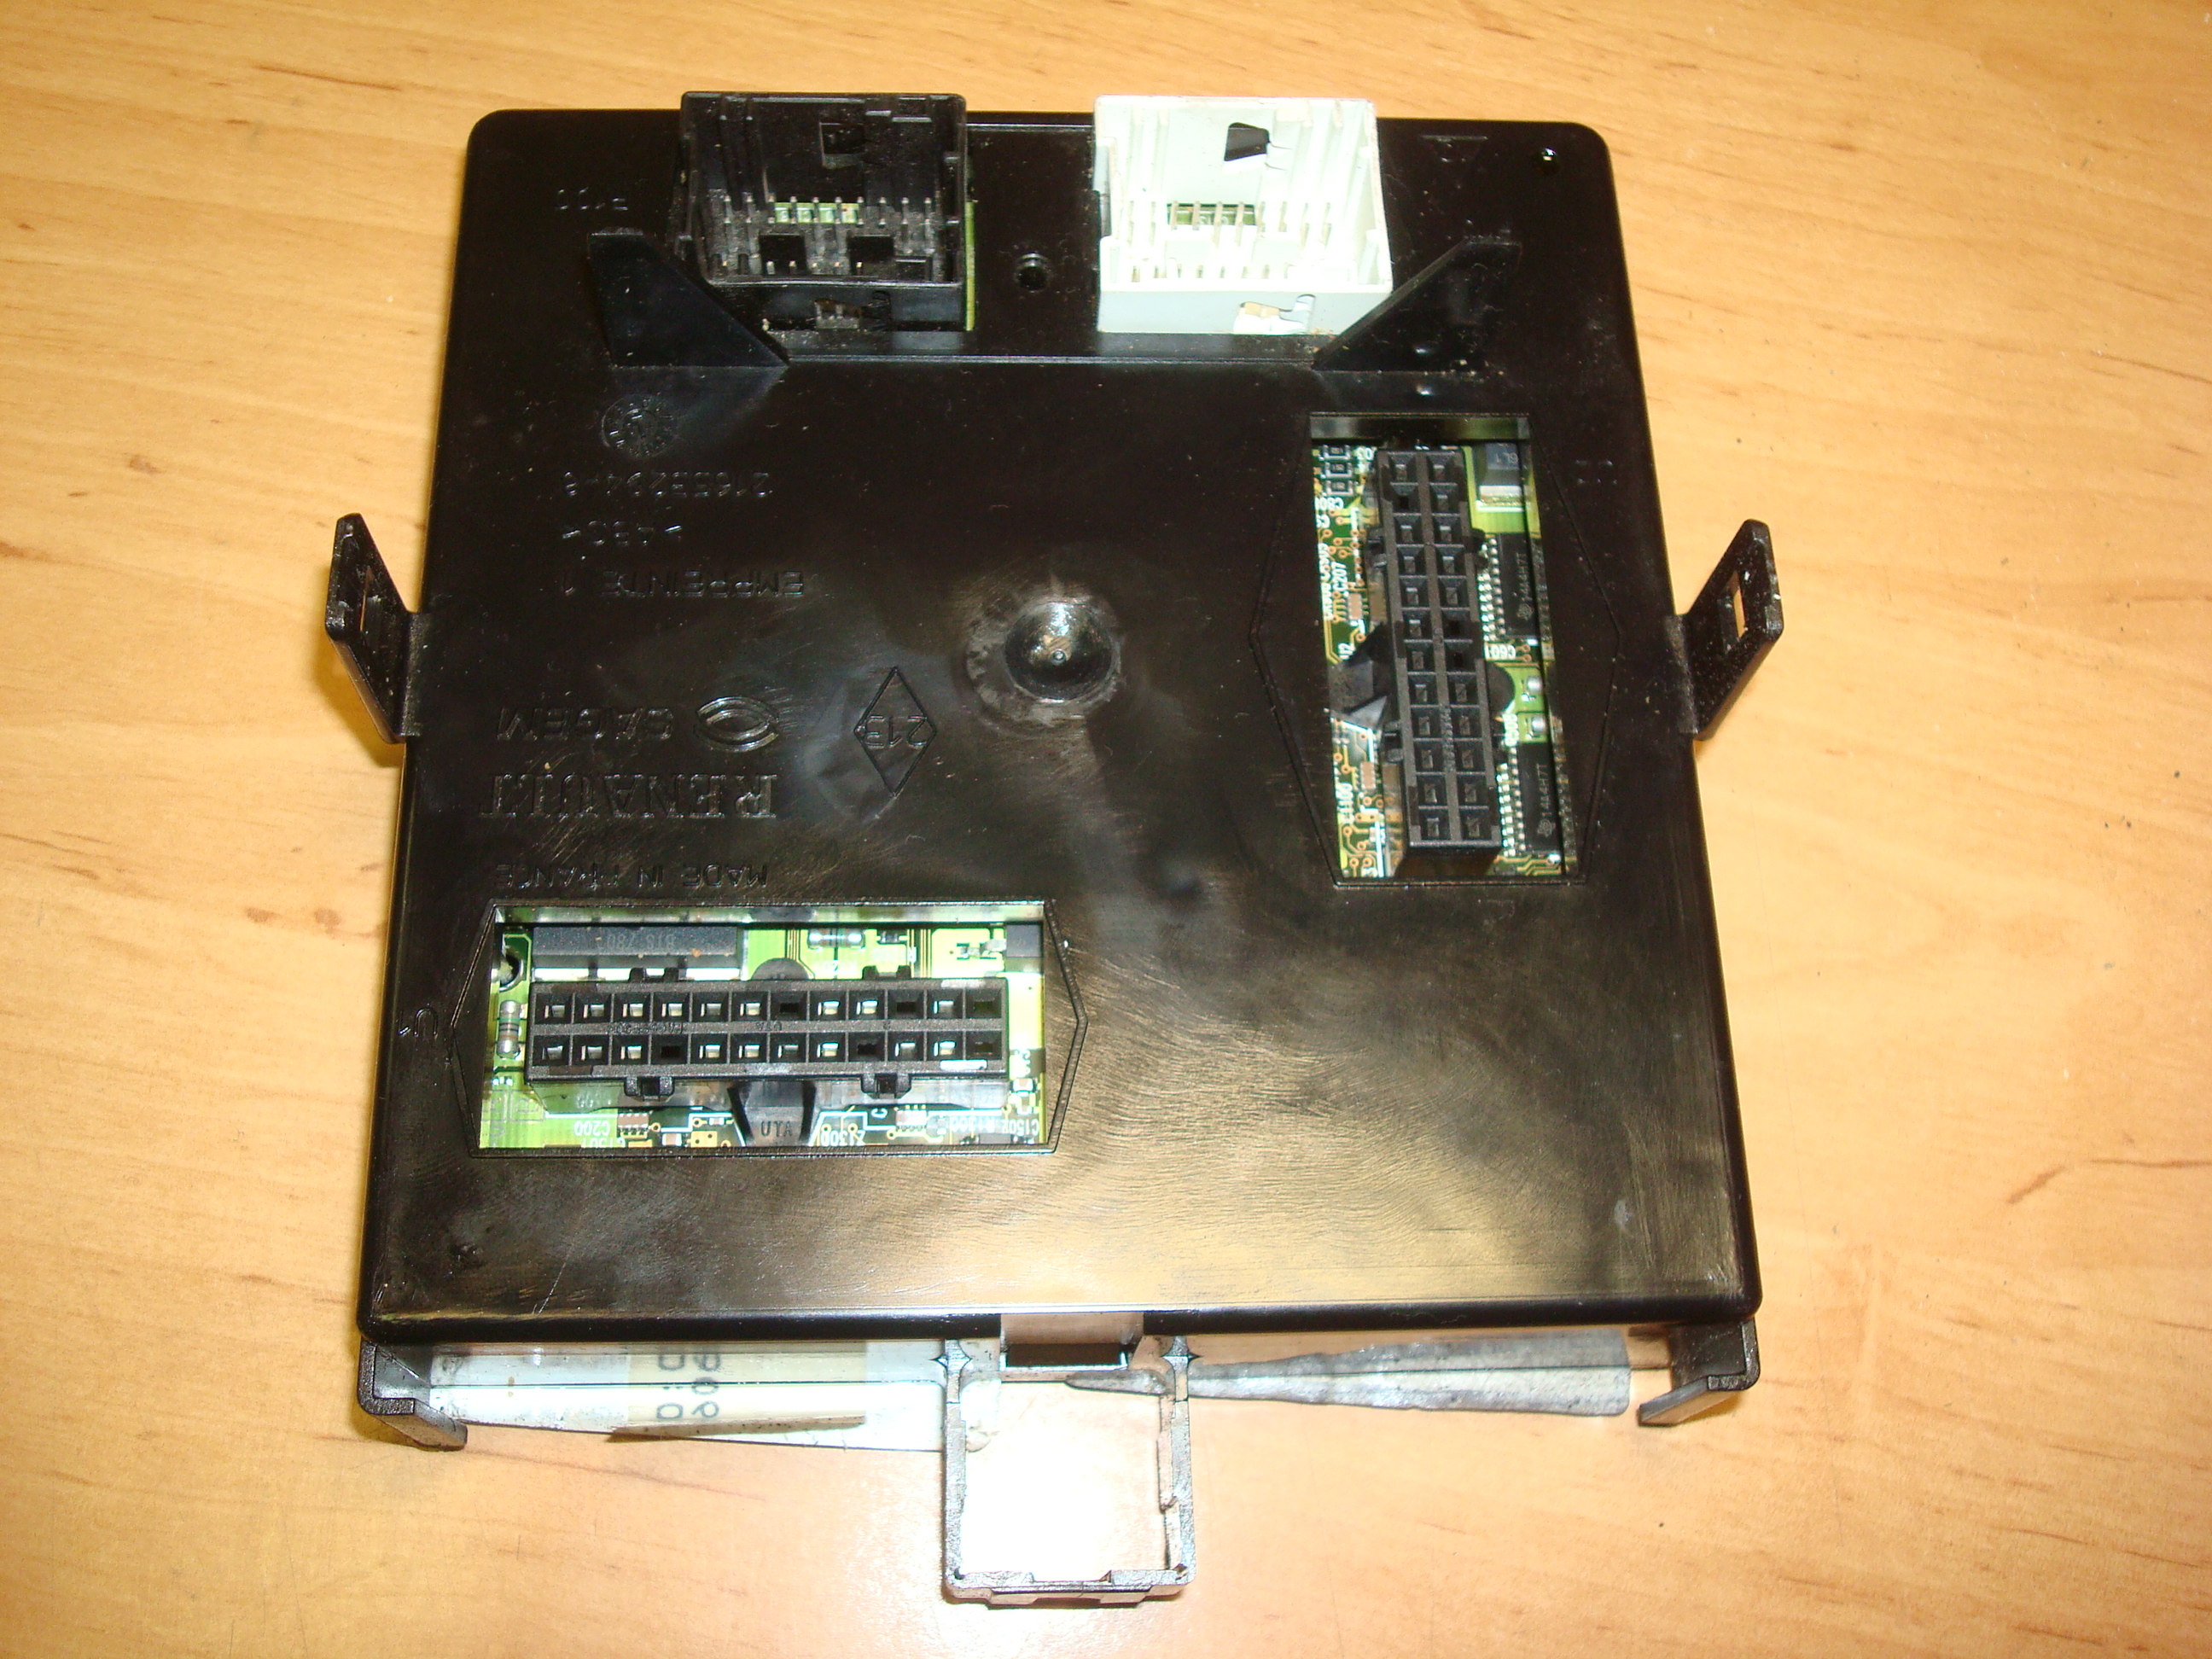 Renault Laguna 01 06 Fuse Box 21653295 1 21653294 8 Cover Article 8200171870